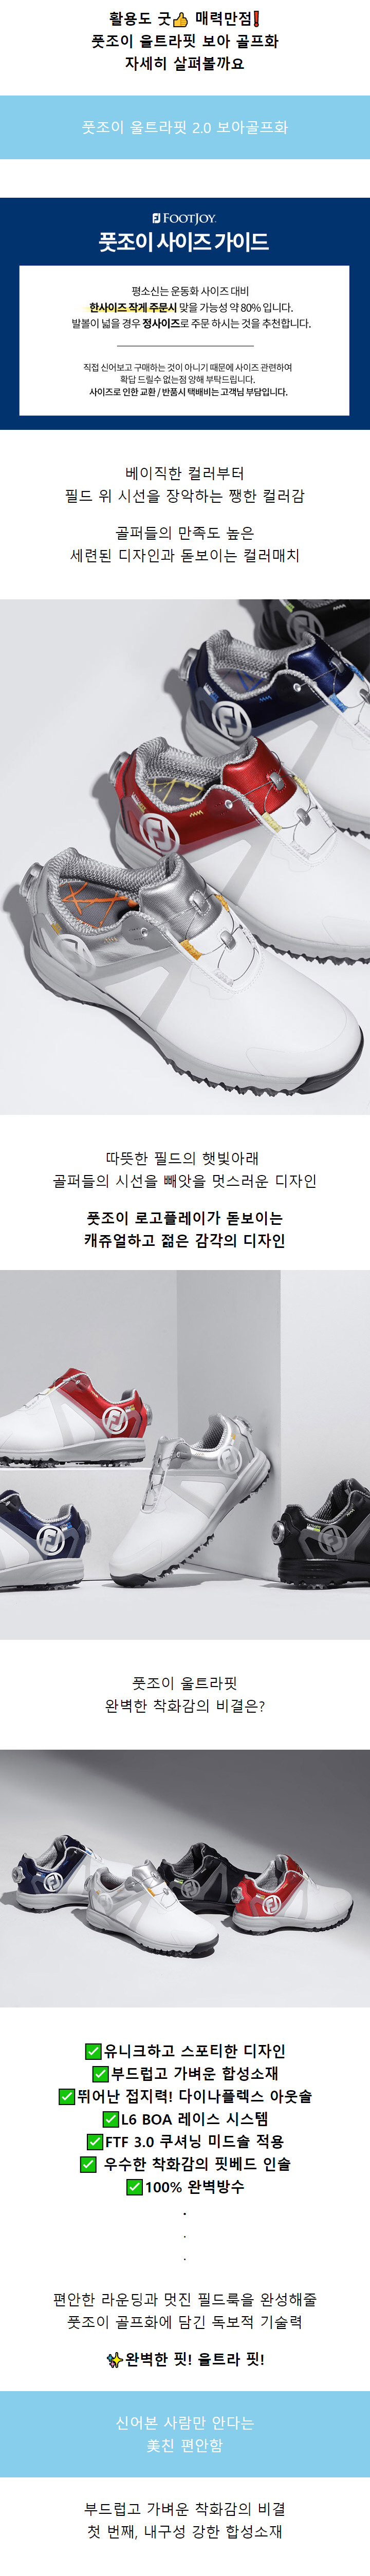 footjoy_ultrapit_20_boa_m_shoes_21_1_11.jpg